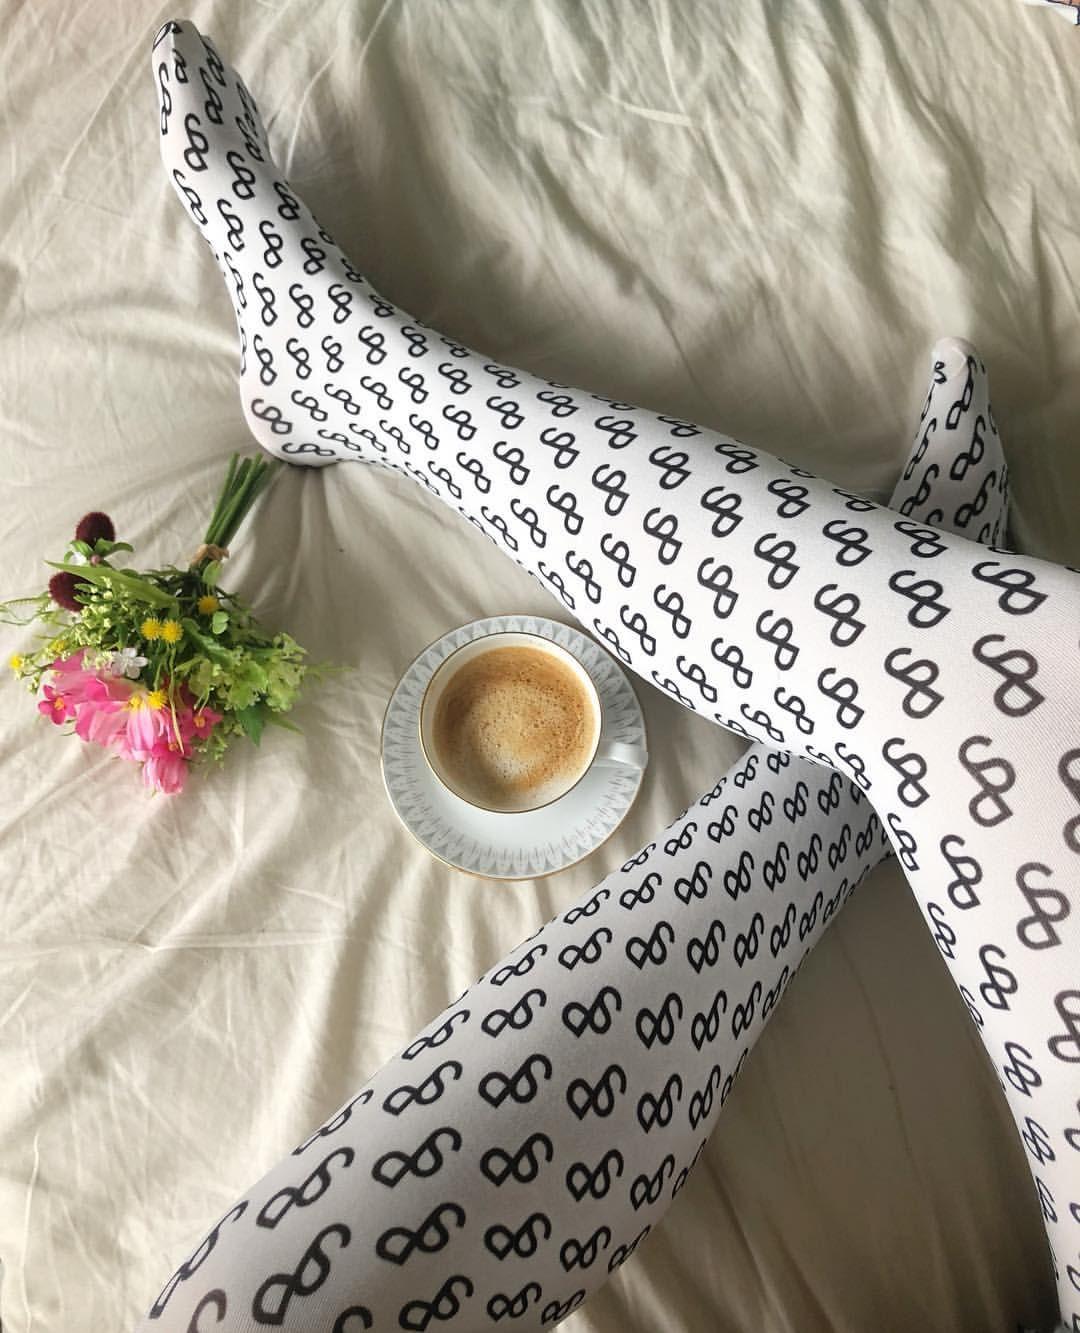 c7c7611b701be Saks Potts tights morning coffee in bed   Moody Board in 2019   Tøj ...